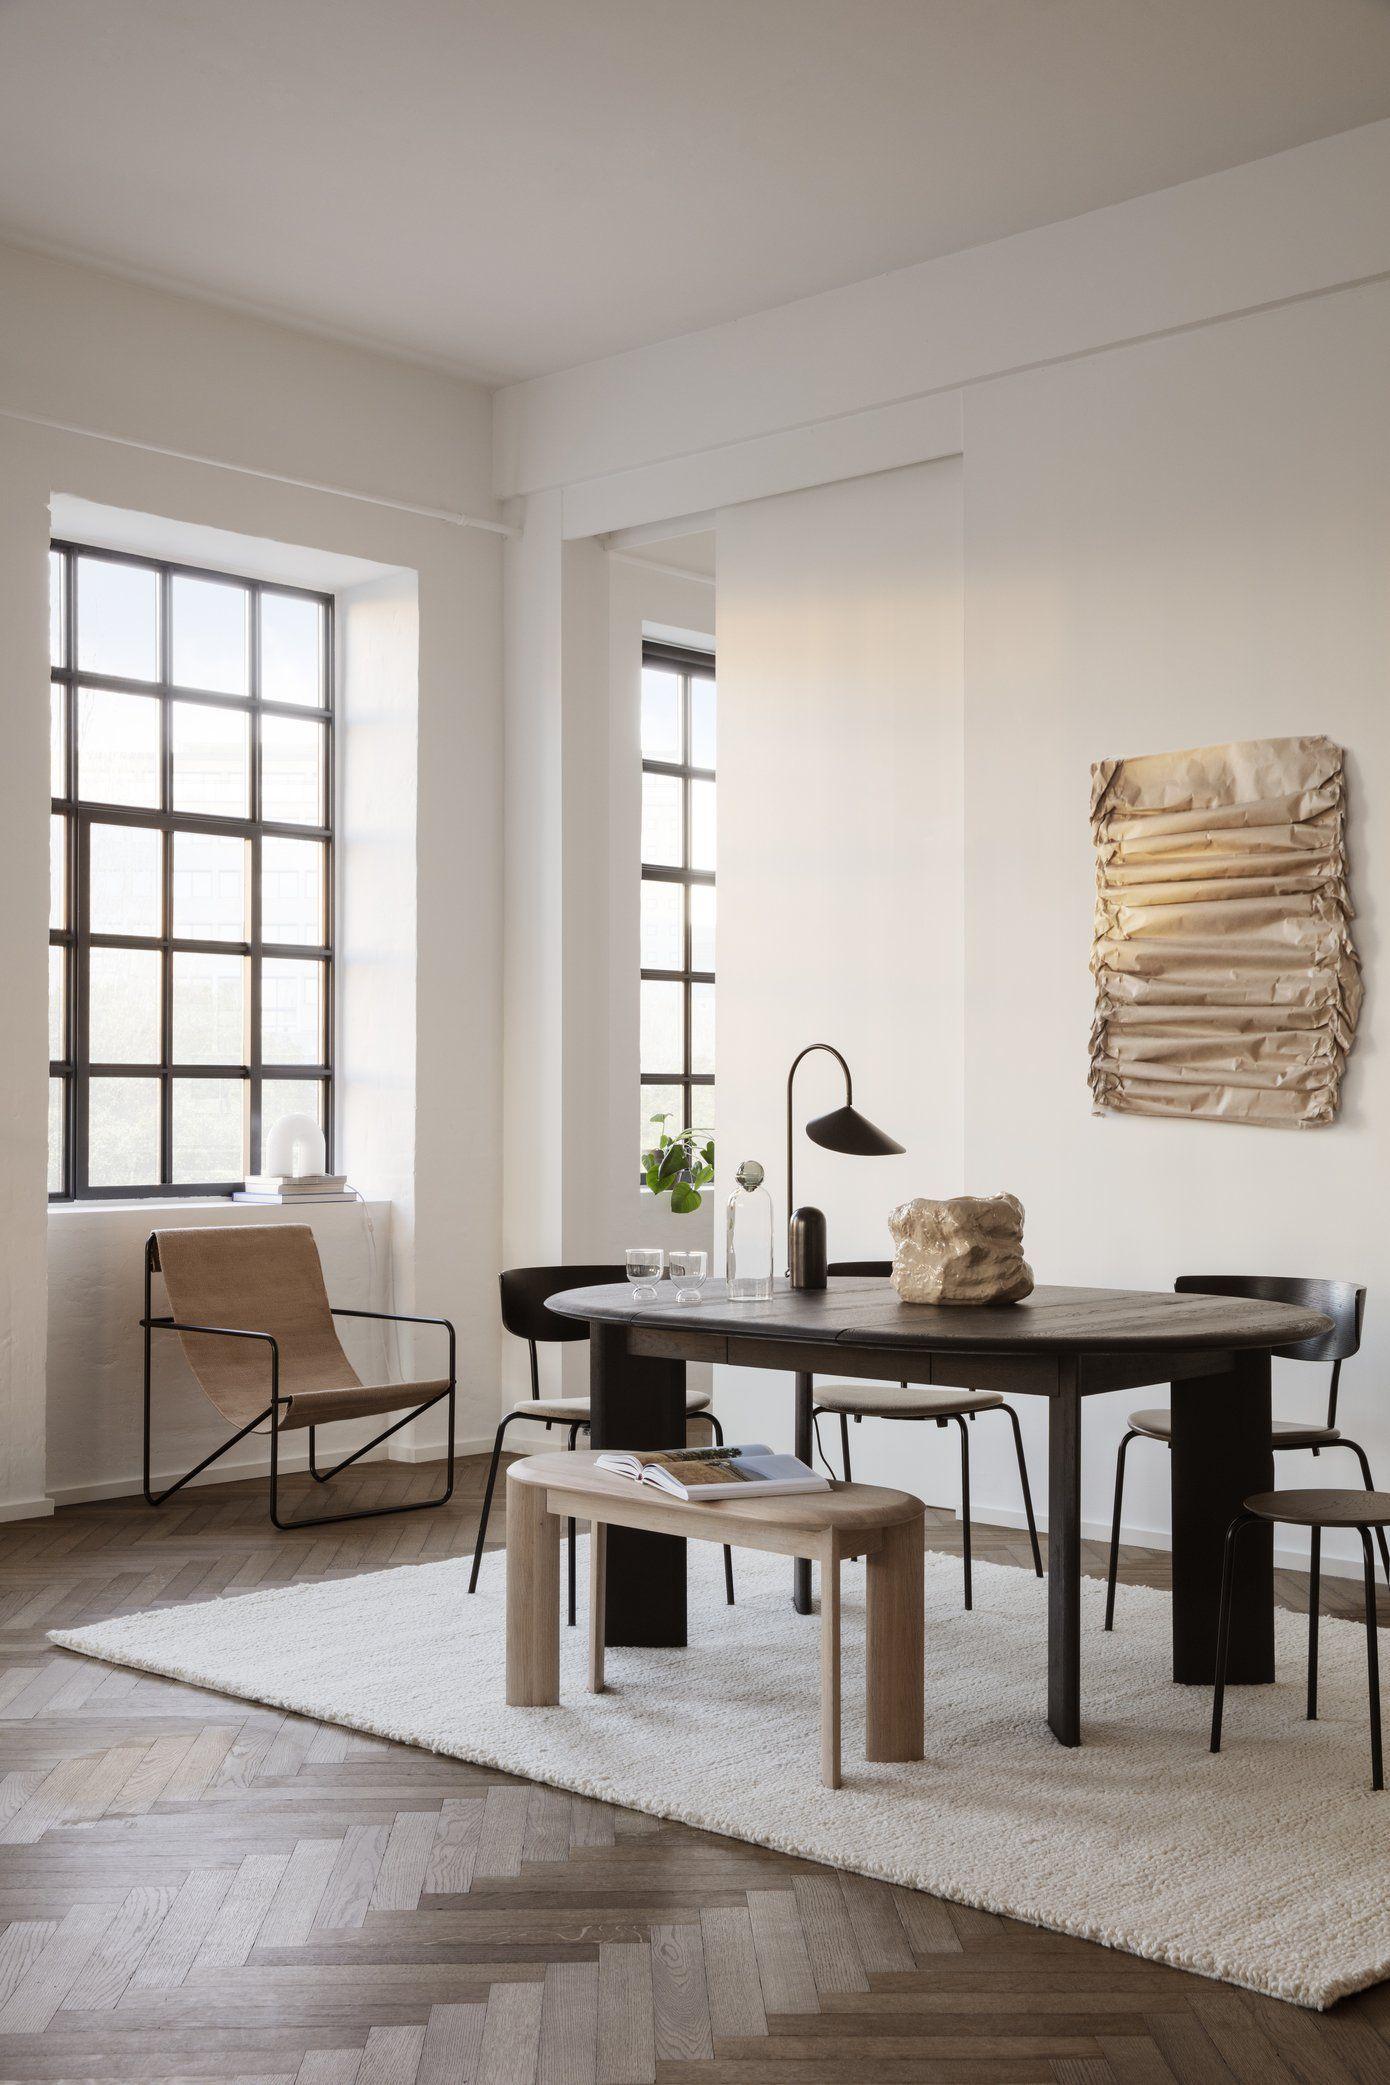 Desert Lounge Chair - Set of 2